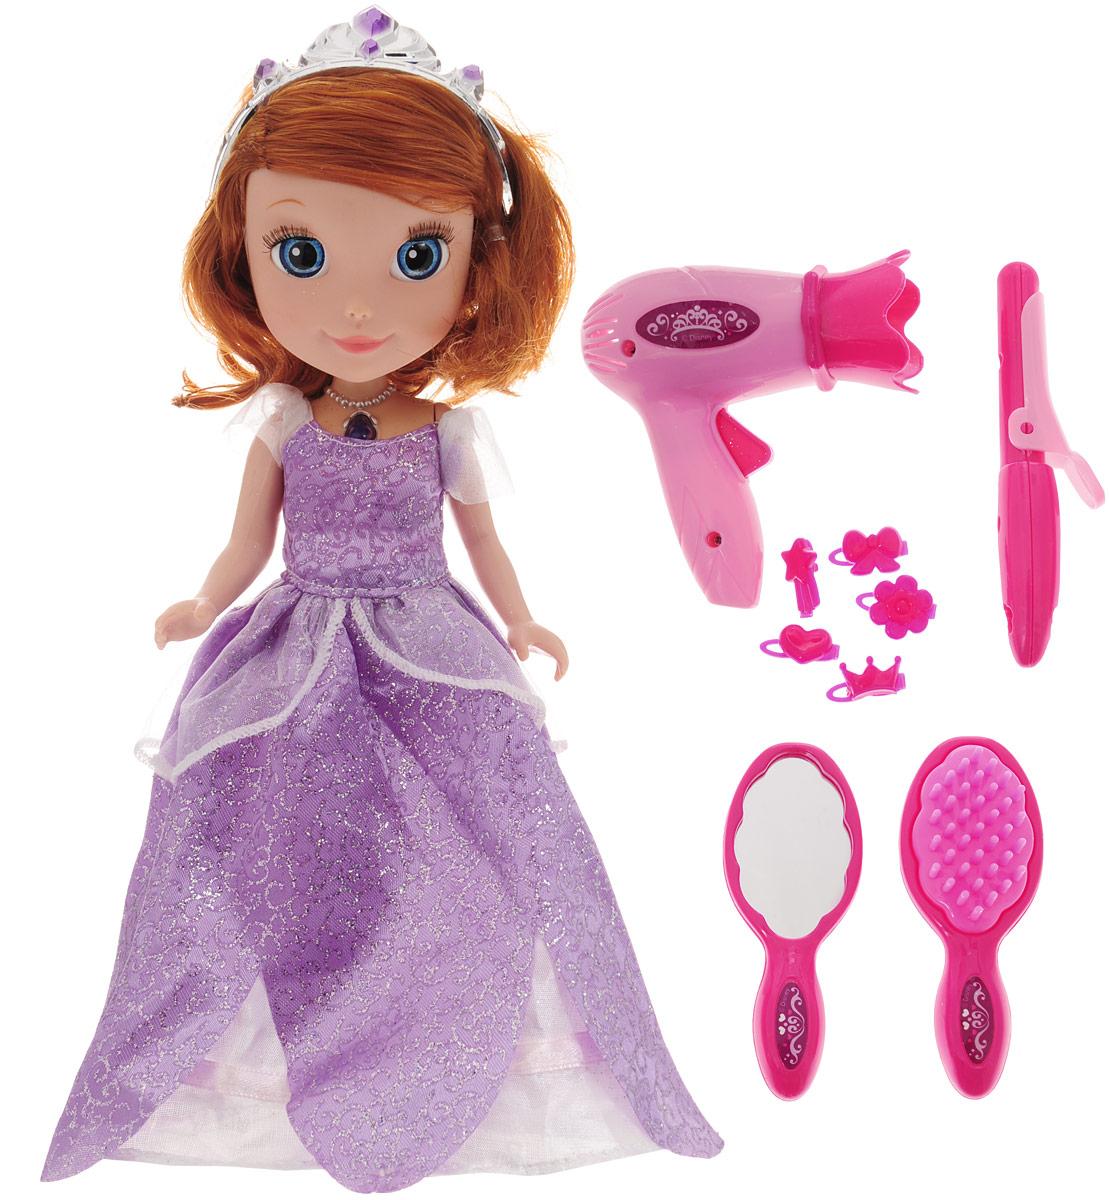 Карапуз Кукла озвученная Disney Принцесса София с аксессуарами куклы карапуз кукла disney принцесса софия